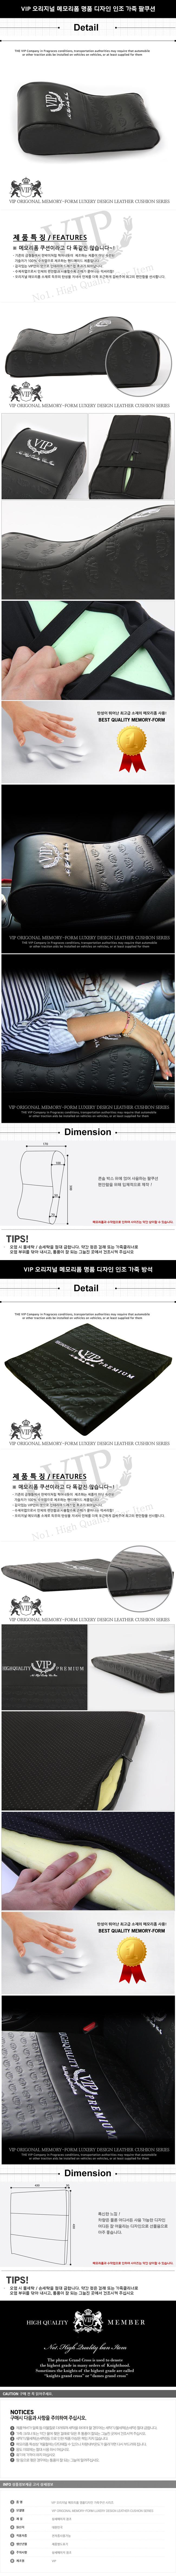 VIP 오리지널 메모리폼 명품디자인 가죽등쿠션 목쿠션 팔쿠션 방석 시리즈